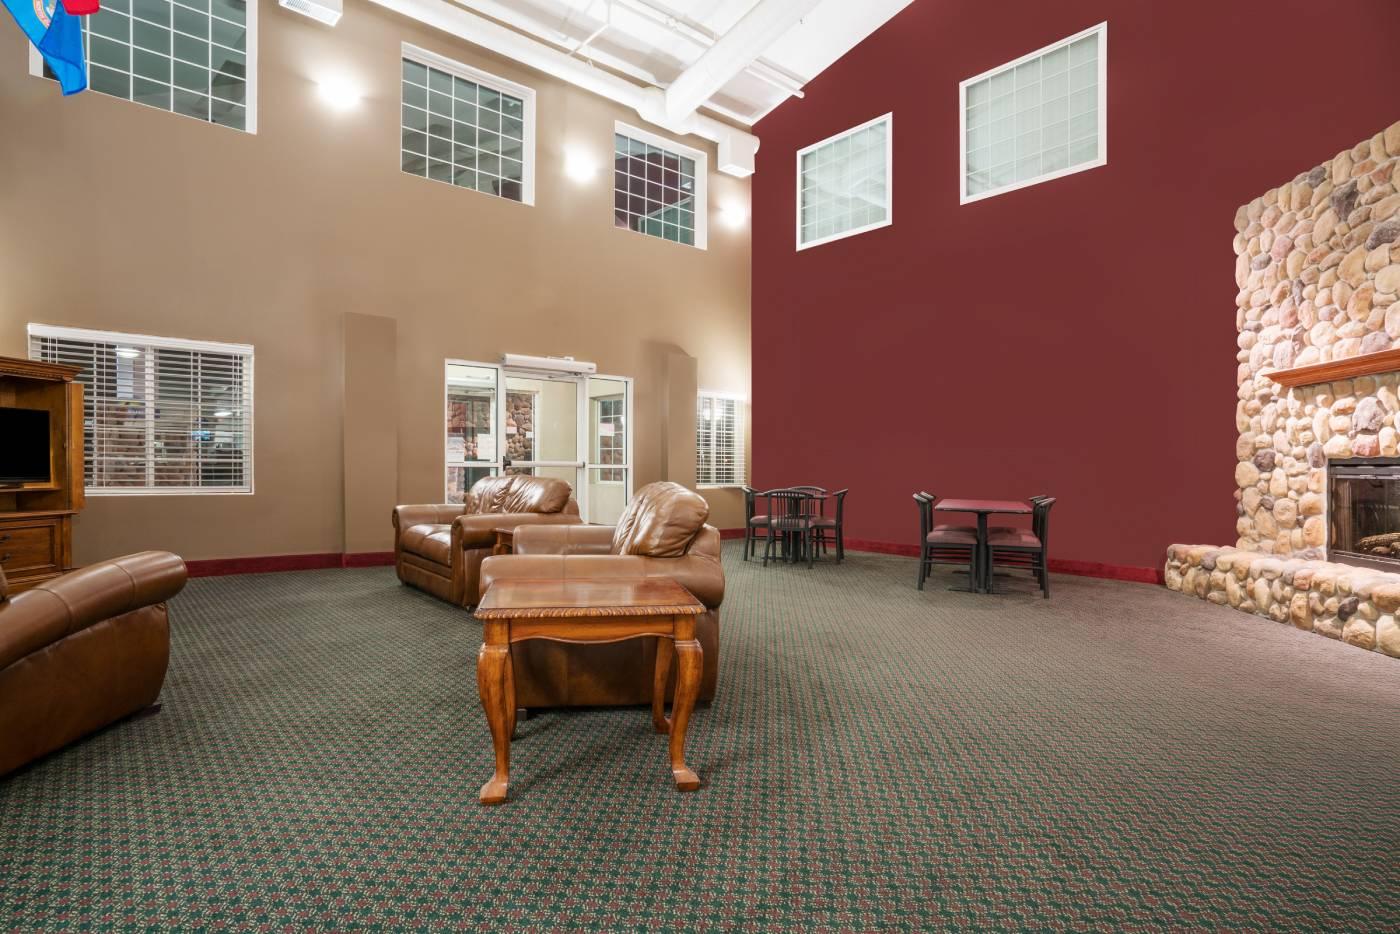 Governors' Inn Lobby